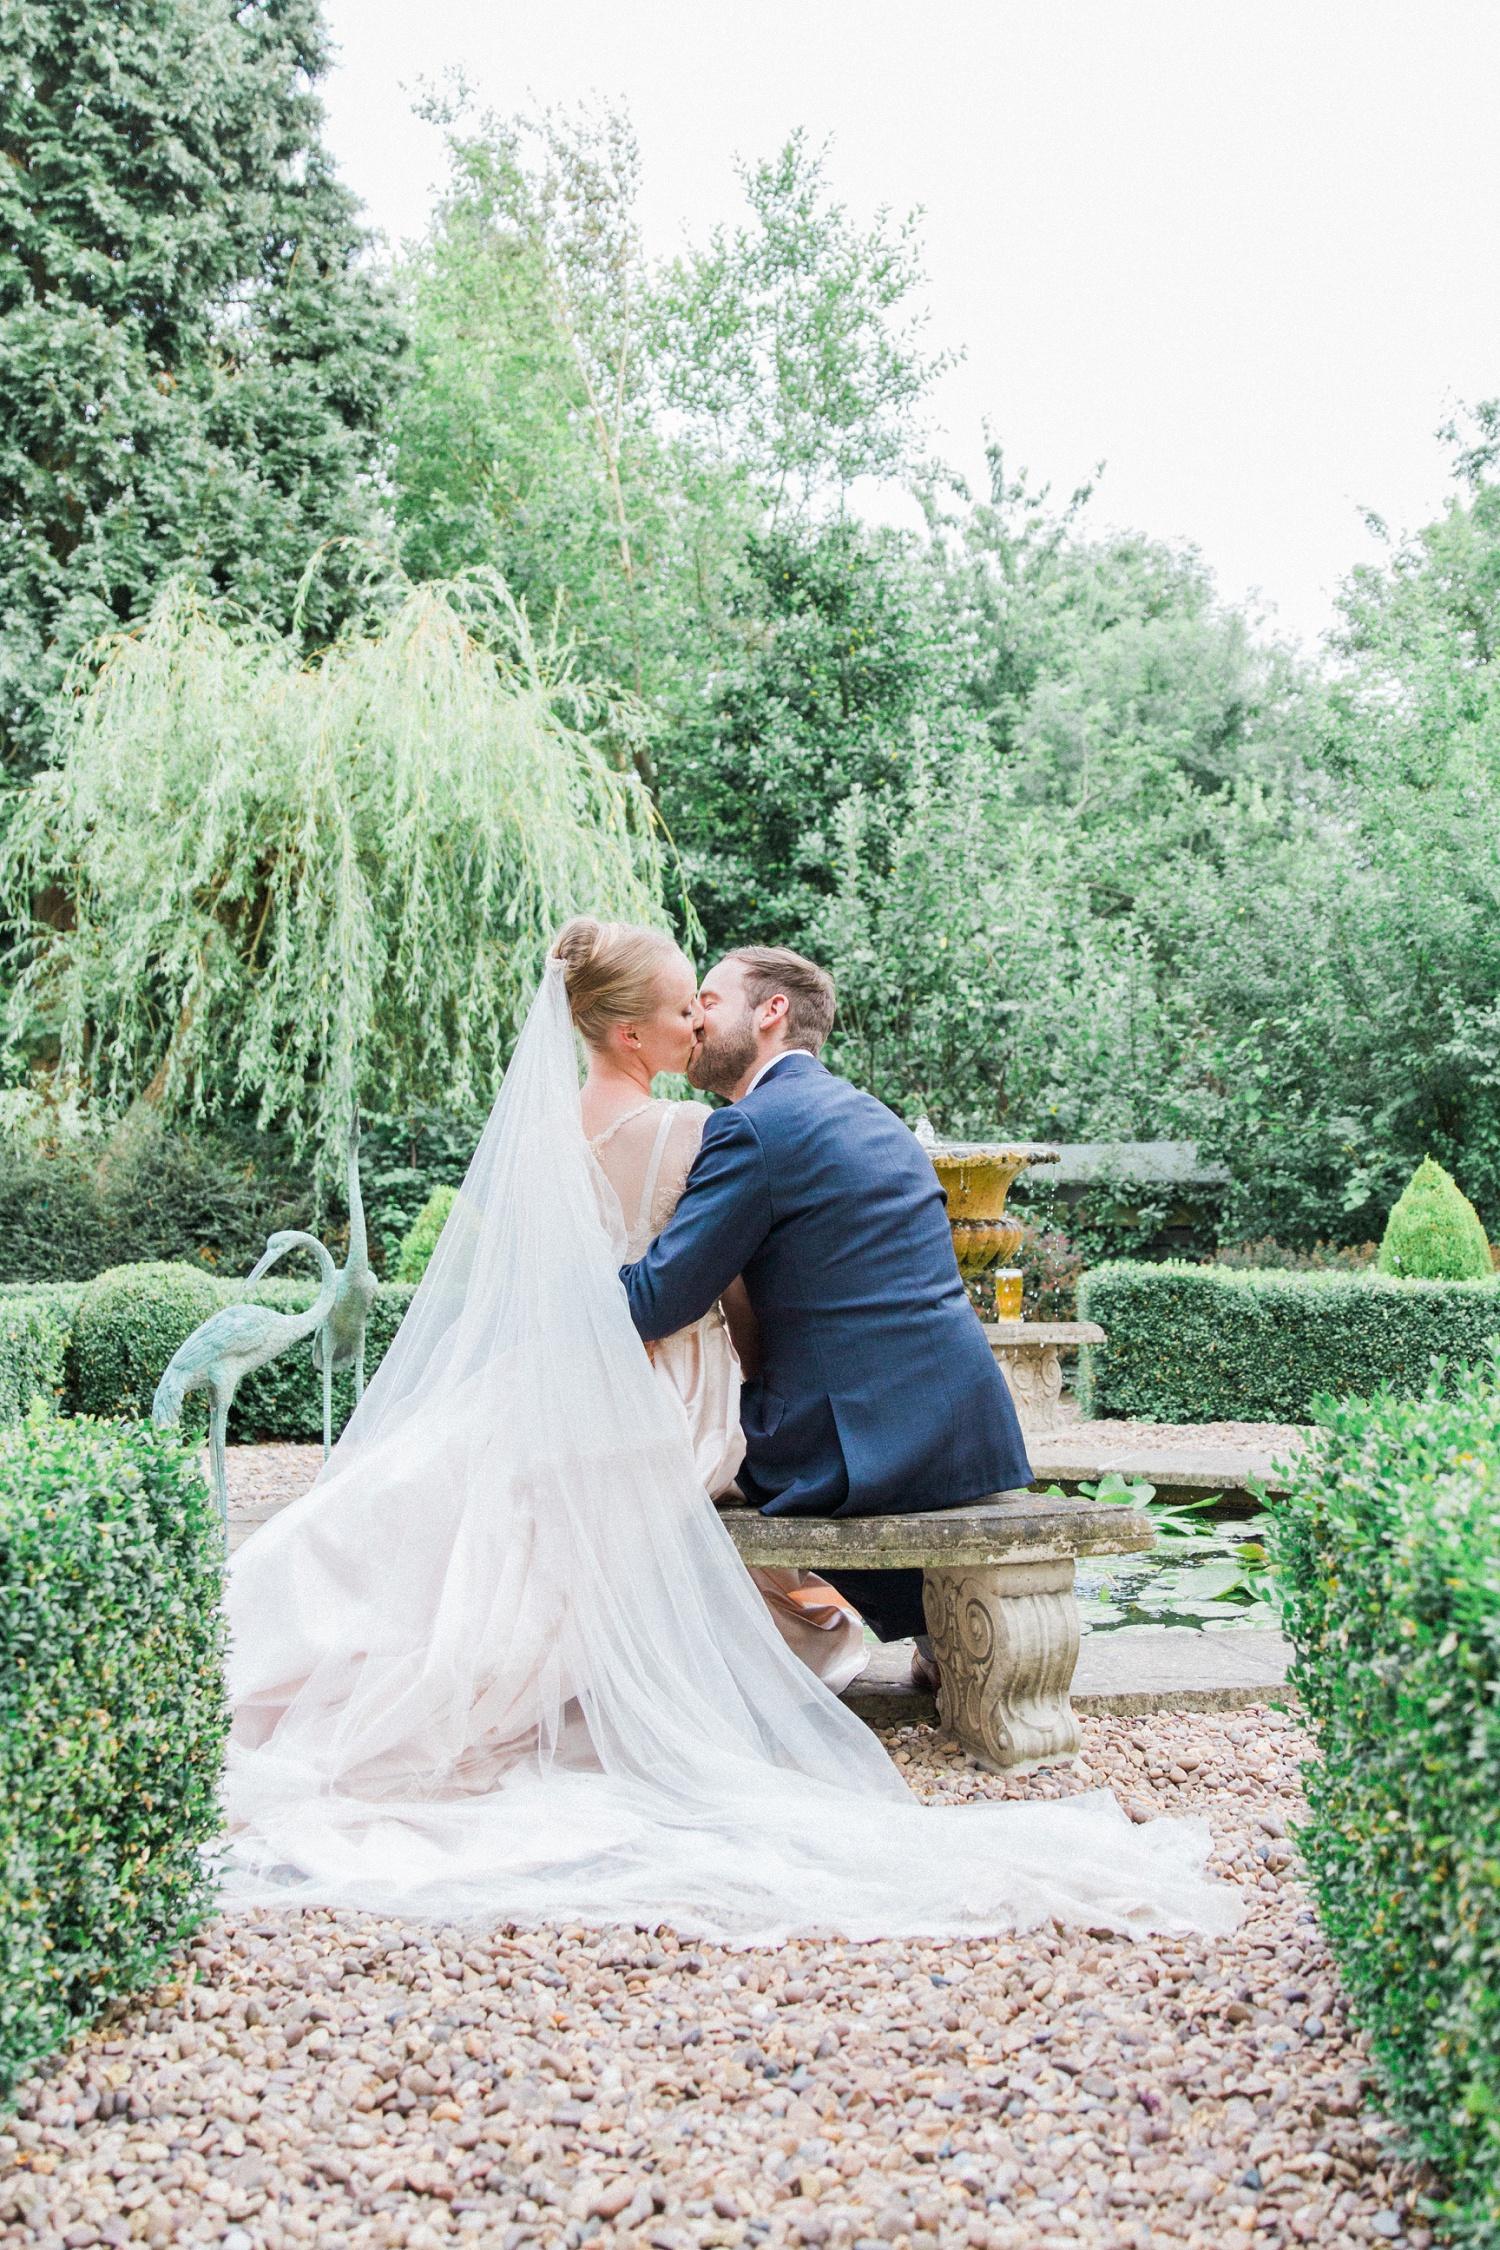 Luxury wedding destinations in the UK